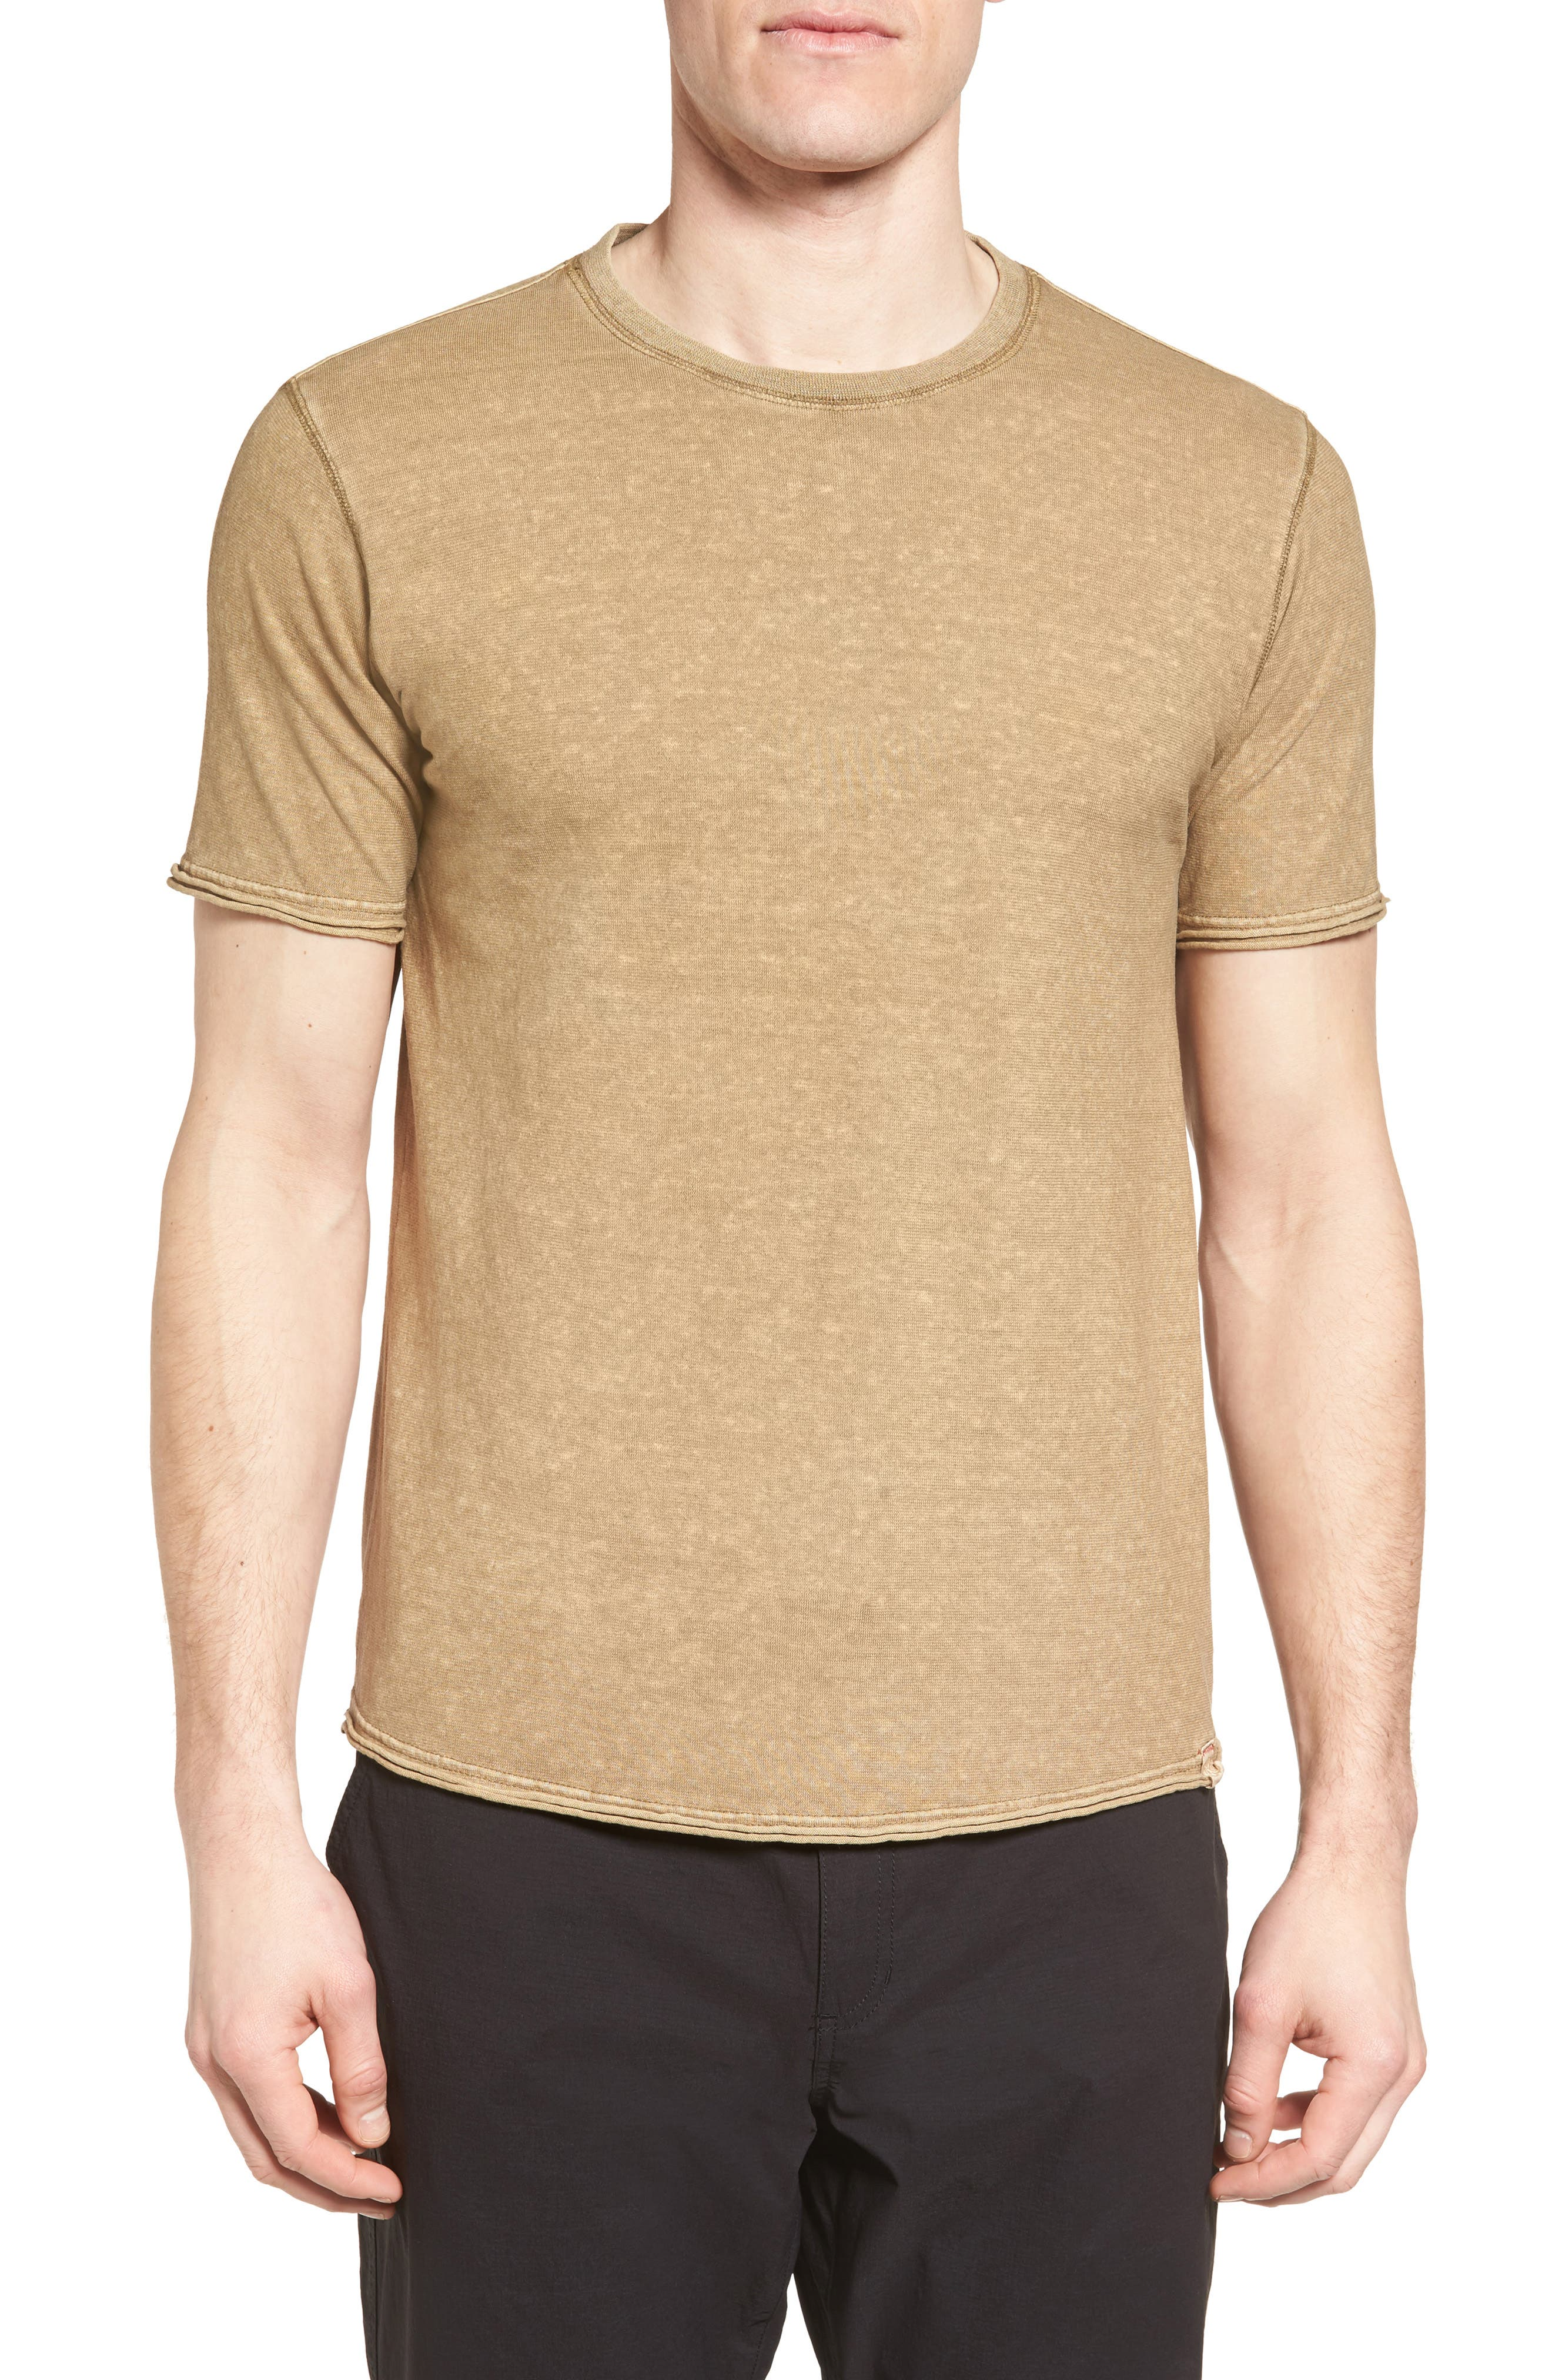 Main Image - Gramicci Camura T-Shirt